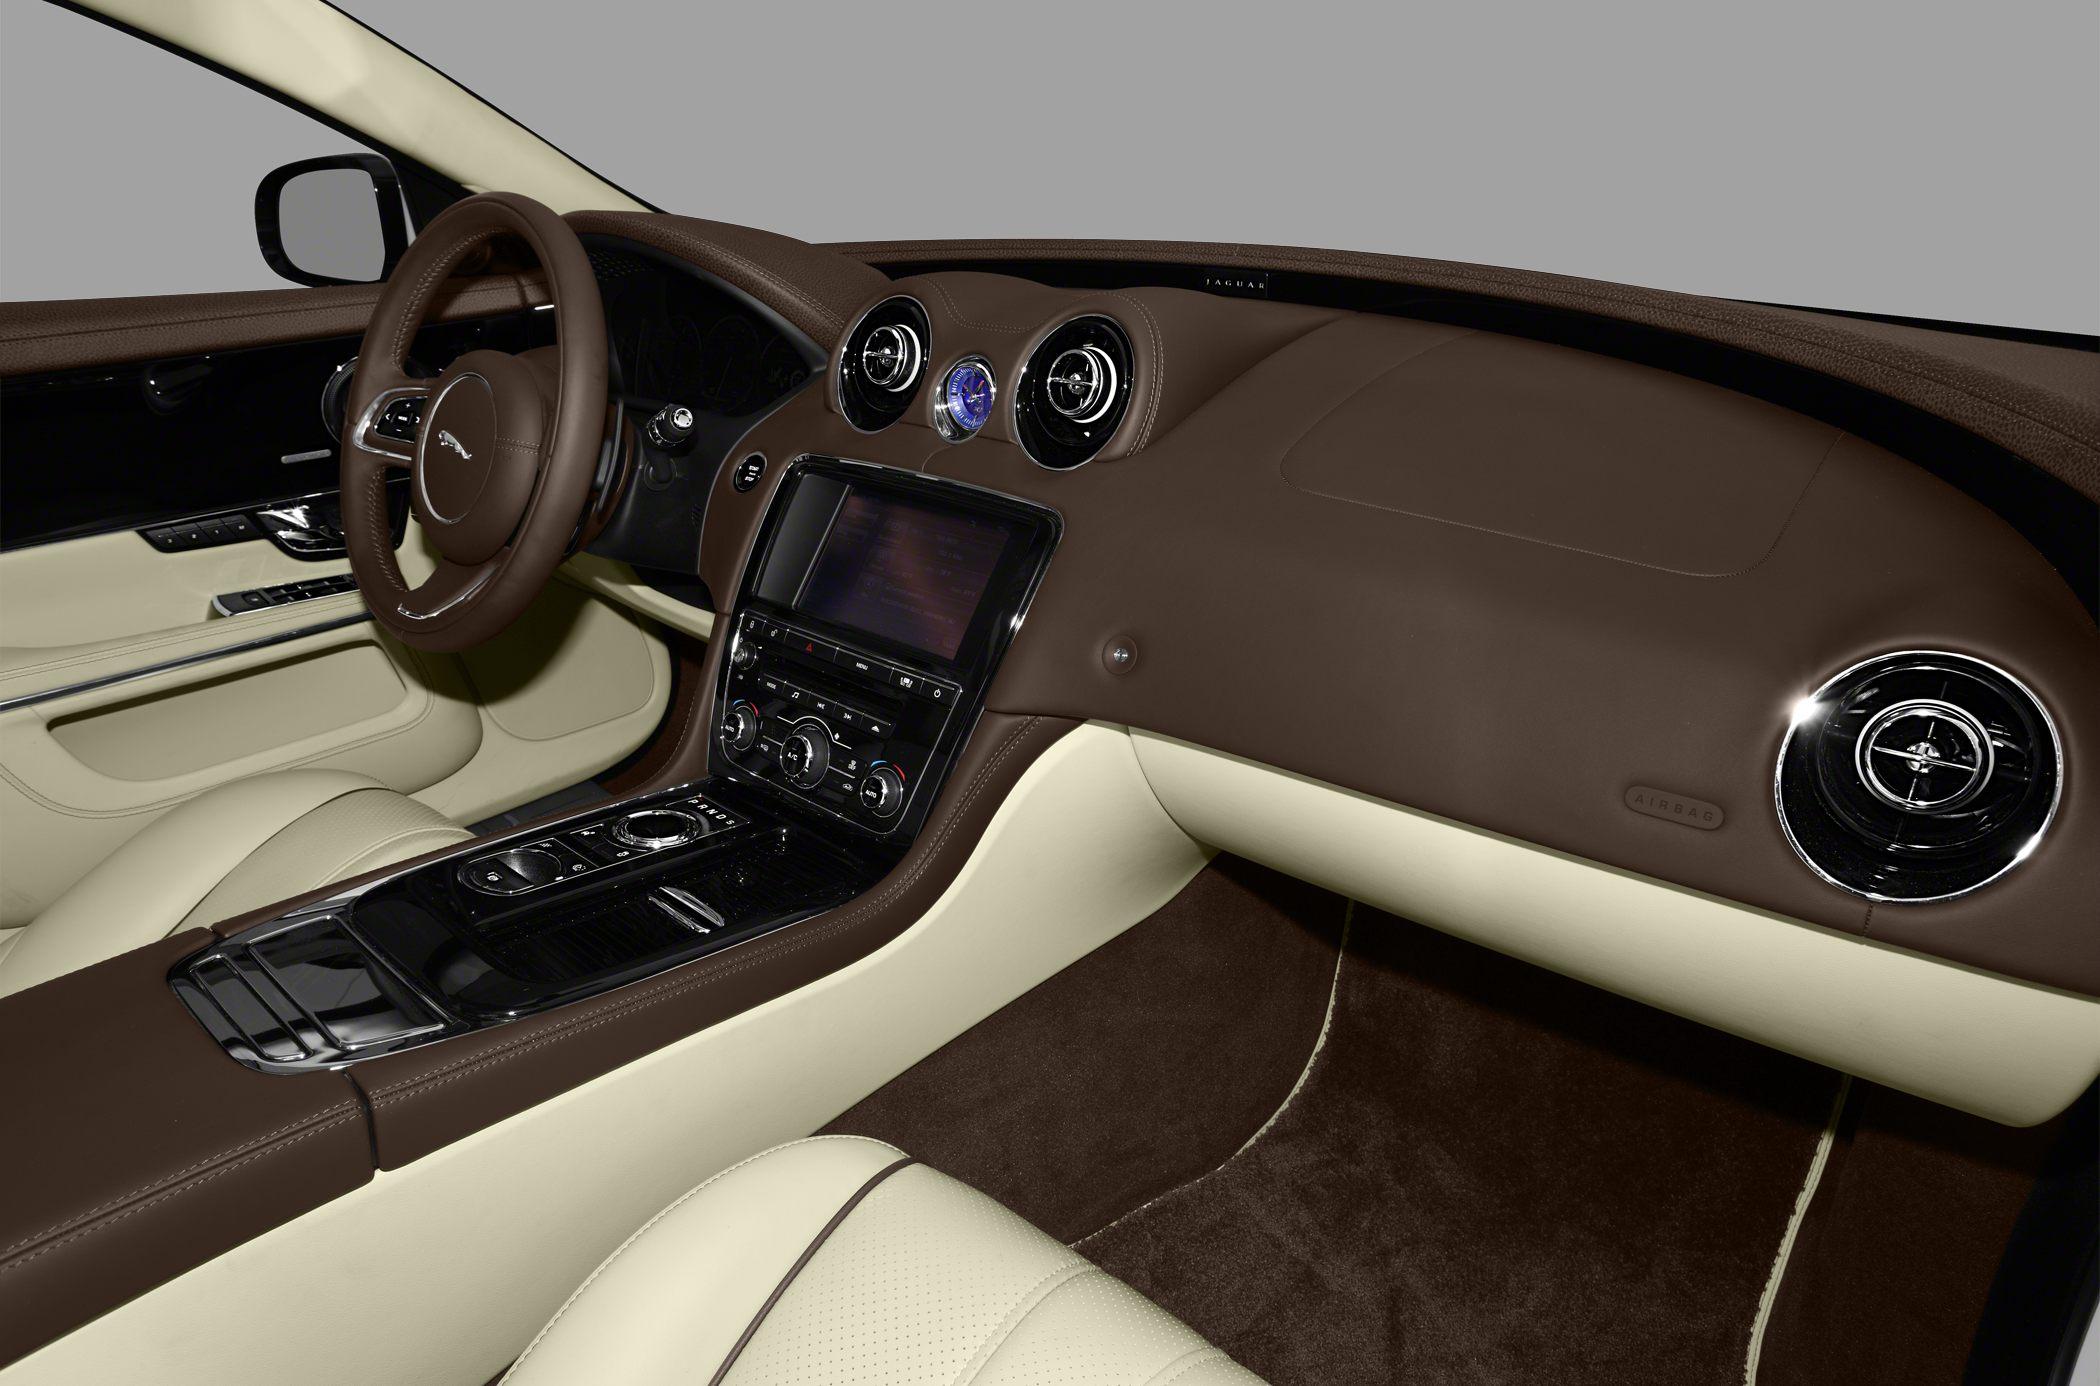 2012 XJ XJL Supersport - New Jaguar XJ XJL Supersport Prices, Reviews